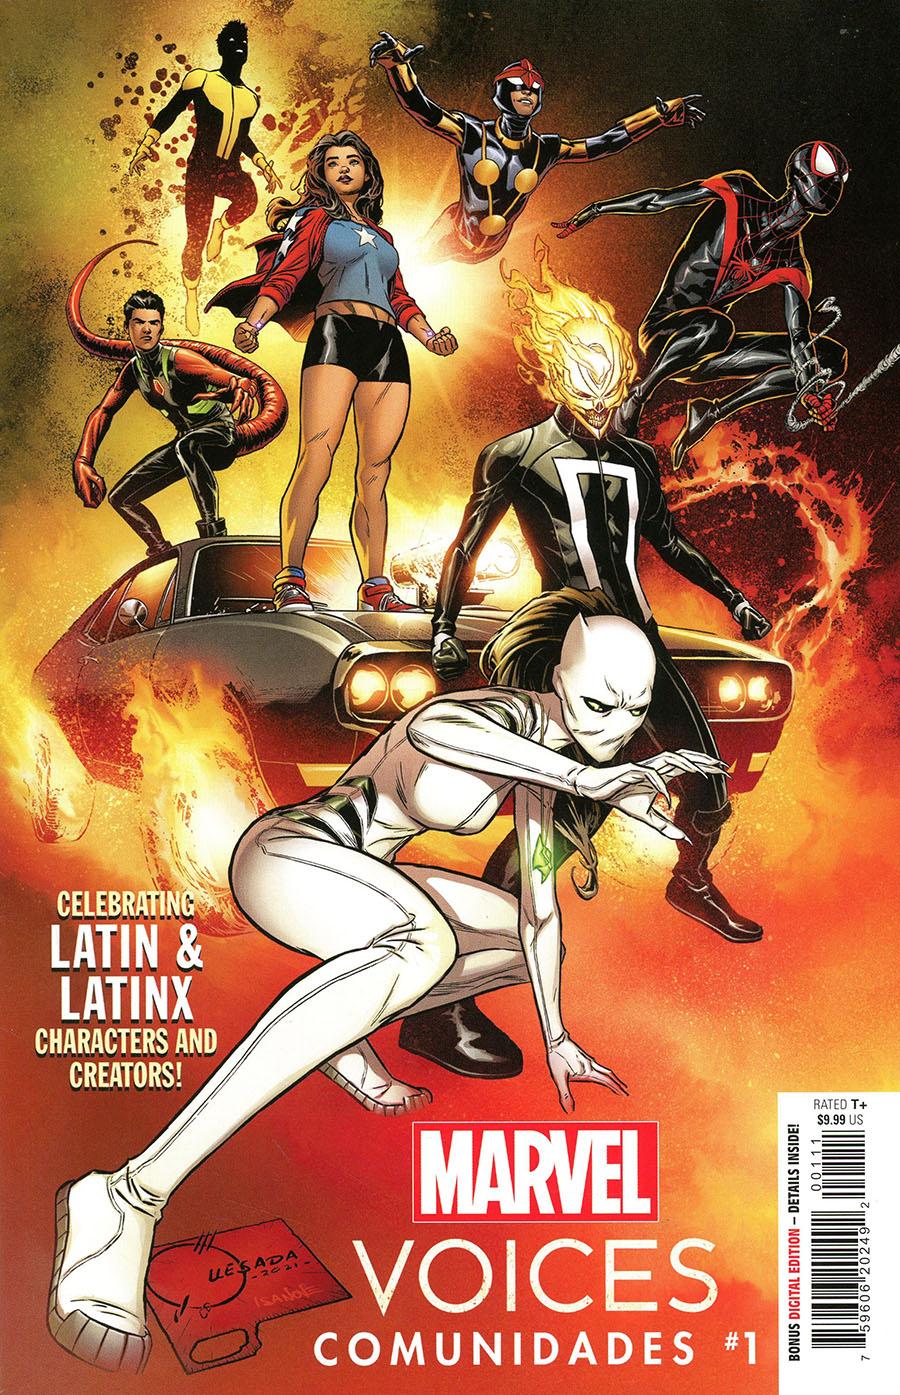 Marvels Voices Community (Comunidades) #1 (One Shot) Cover A Regular Joe Quesada Cover